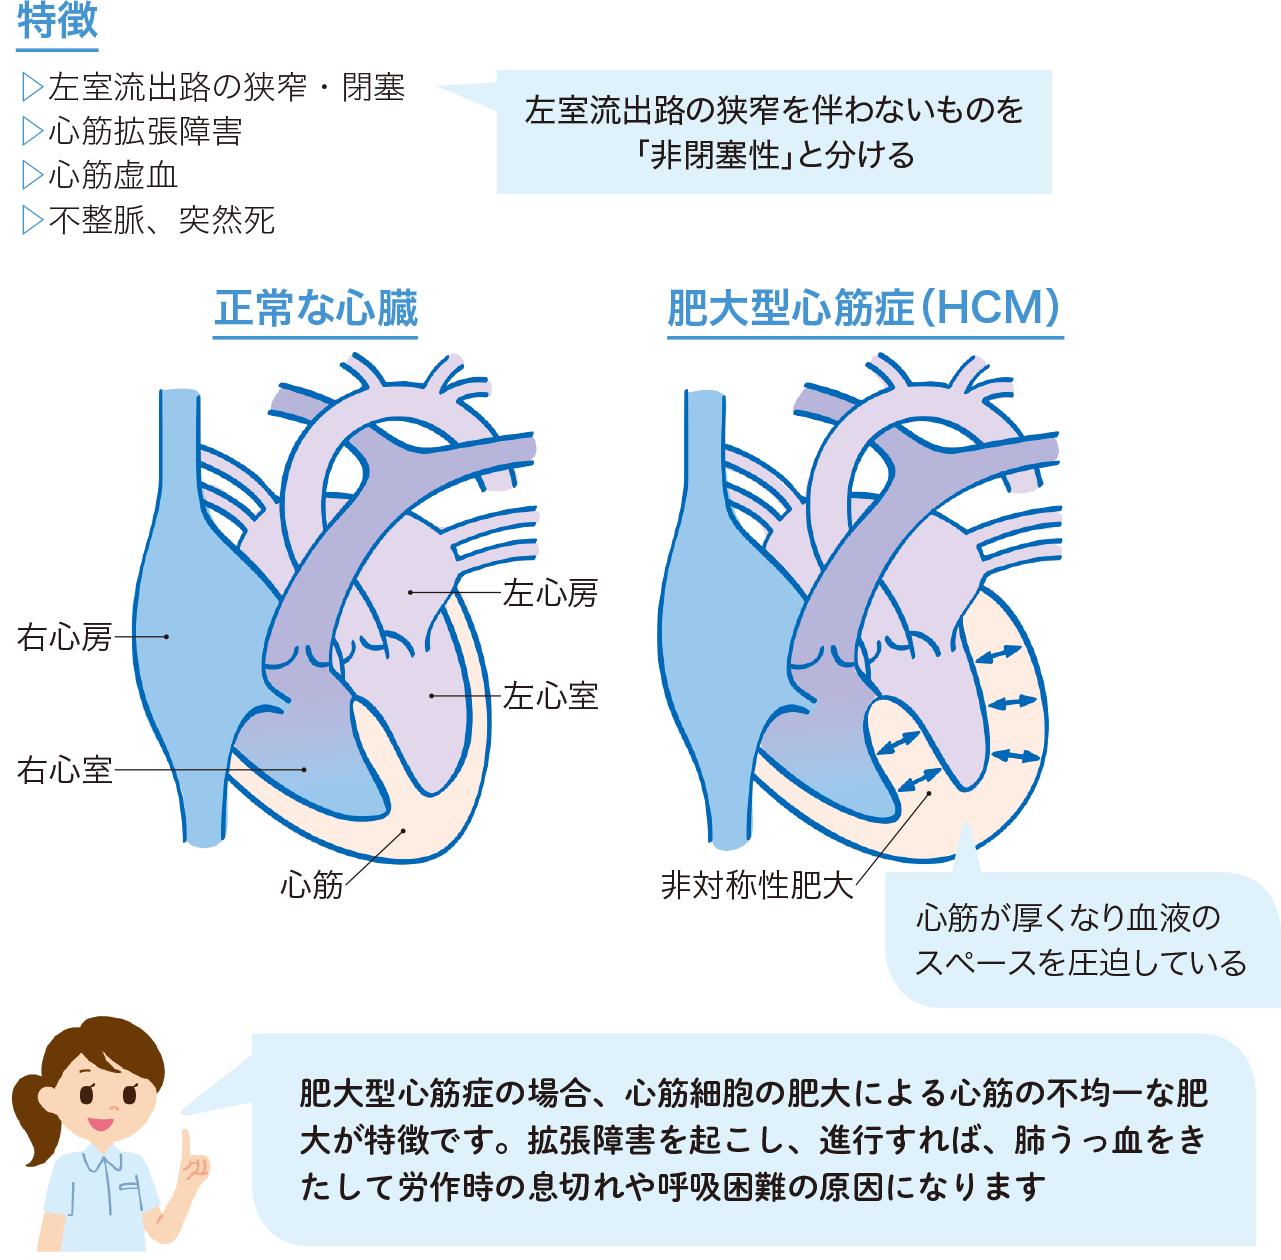 肥大型心筋症の病態